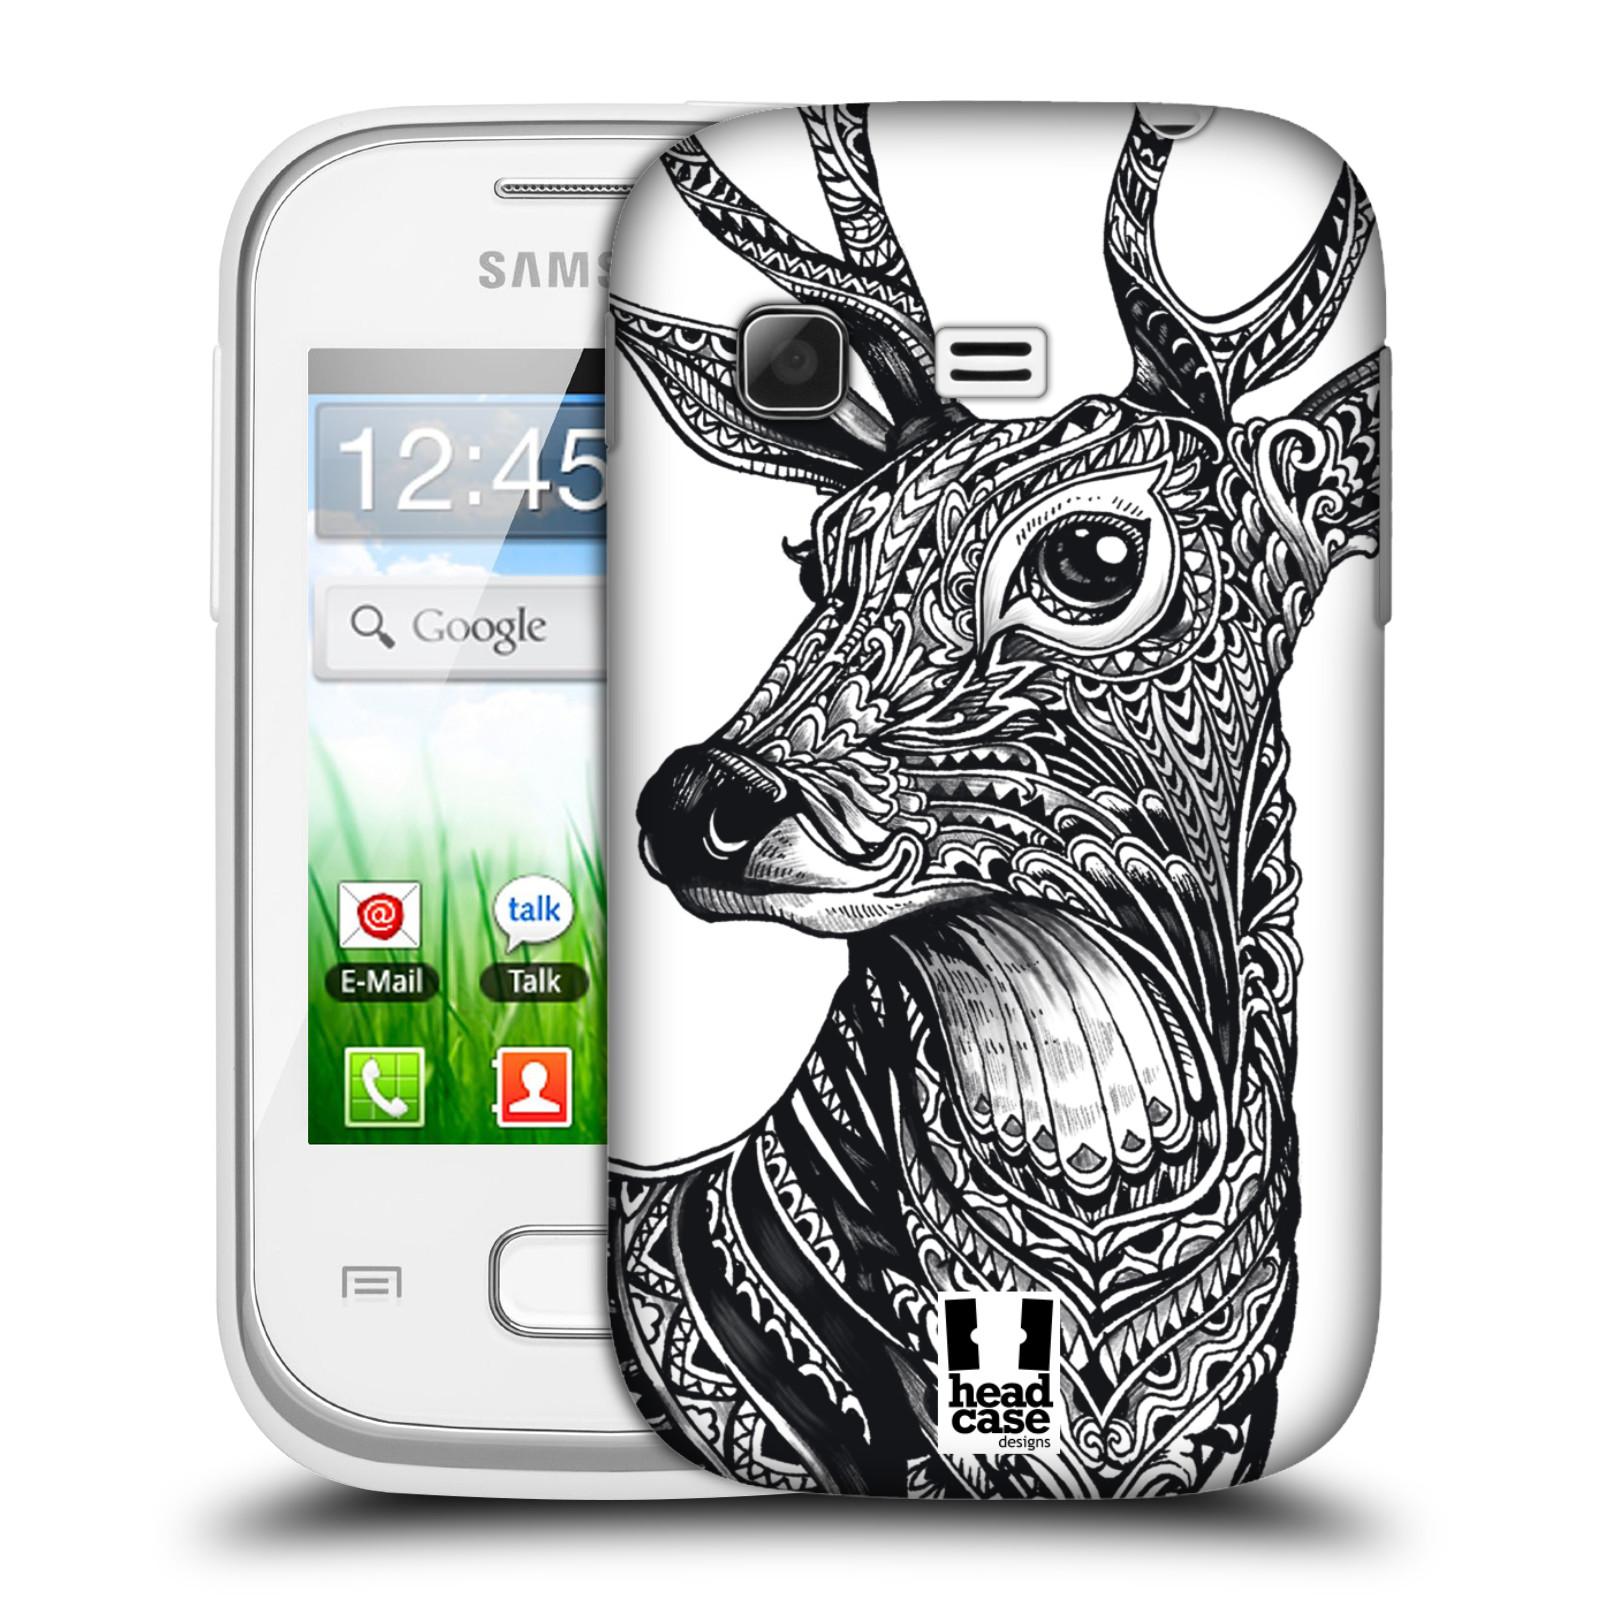 Plastové pouzdro na mobil Samsung Galaxy Pocket HEAD CASE Zdobený Jelínek (Plastový kryt či obal na mobilní telefon Samsung Galaxy Pocket GT-S5300)